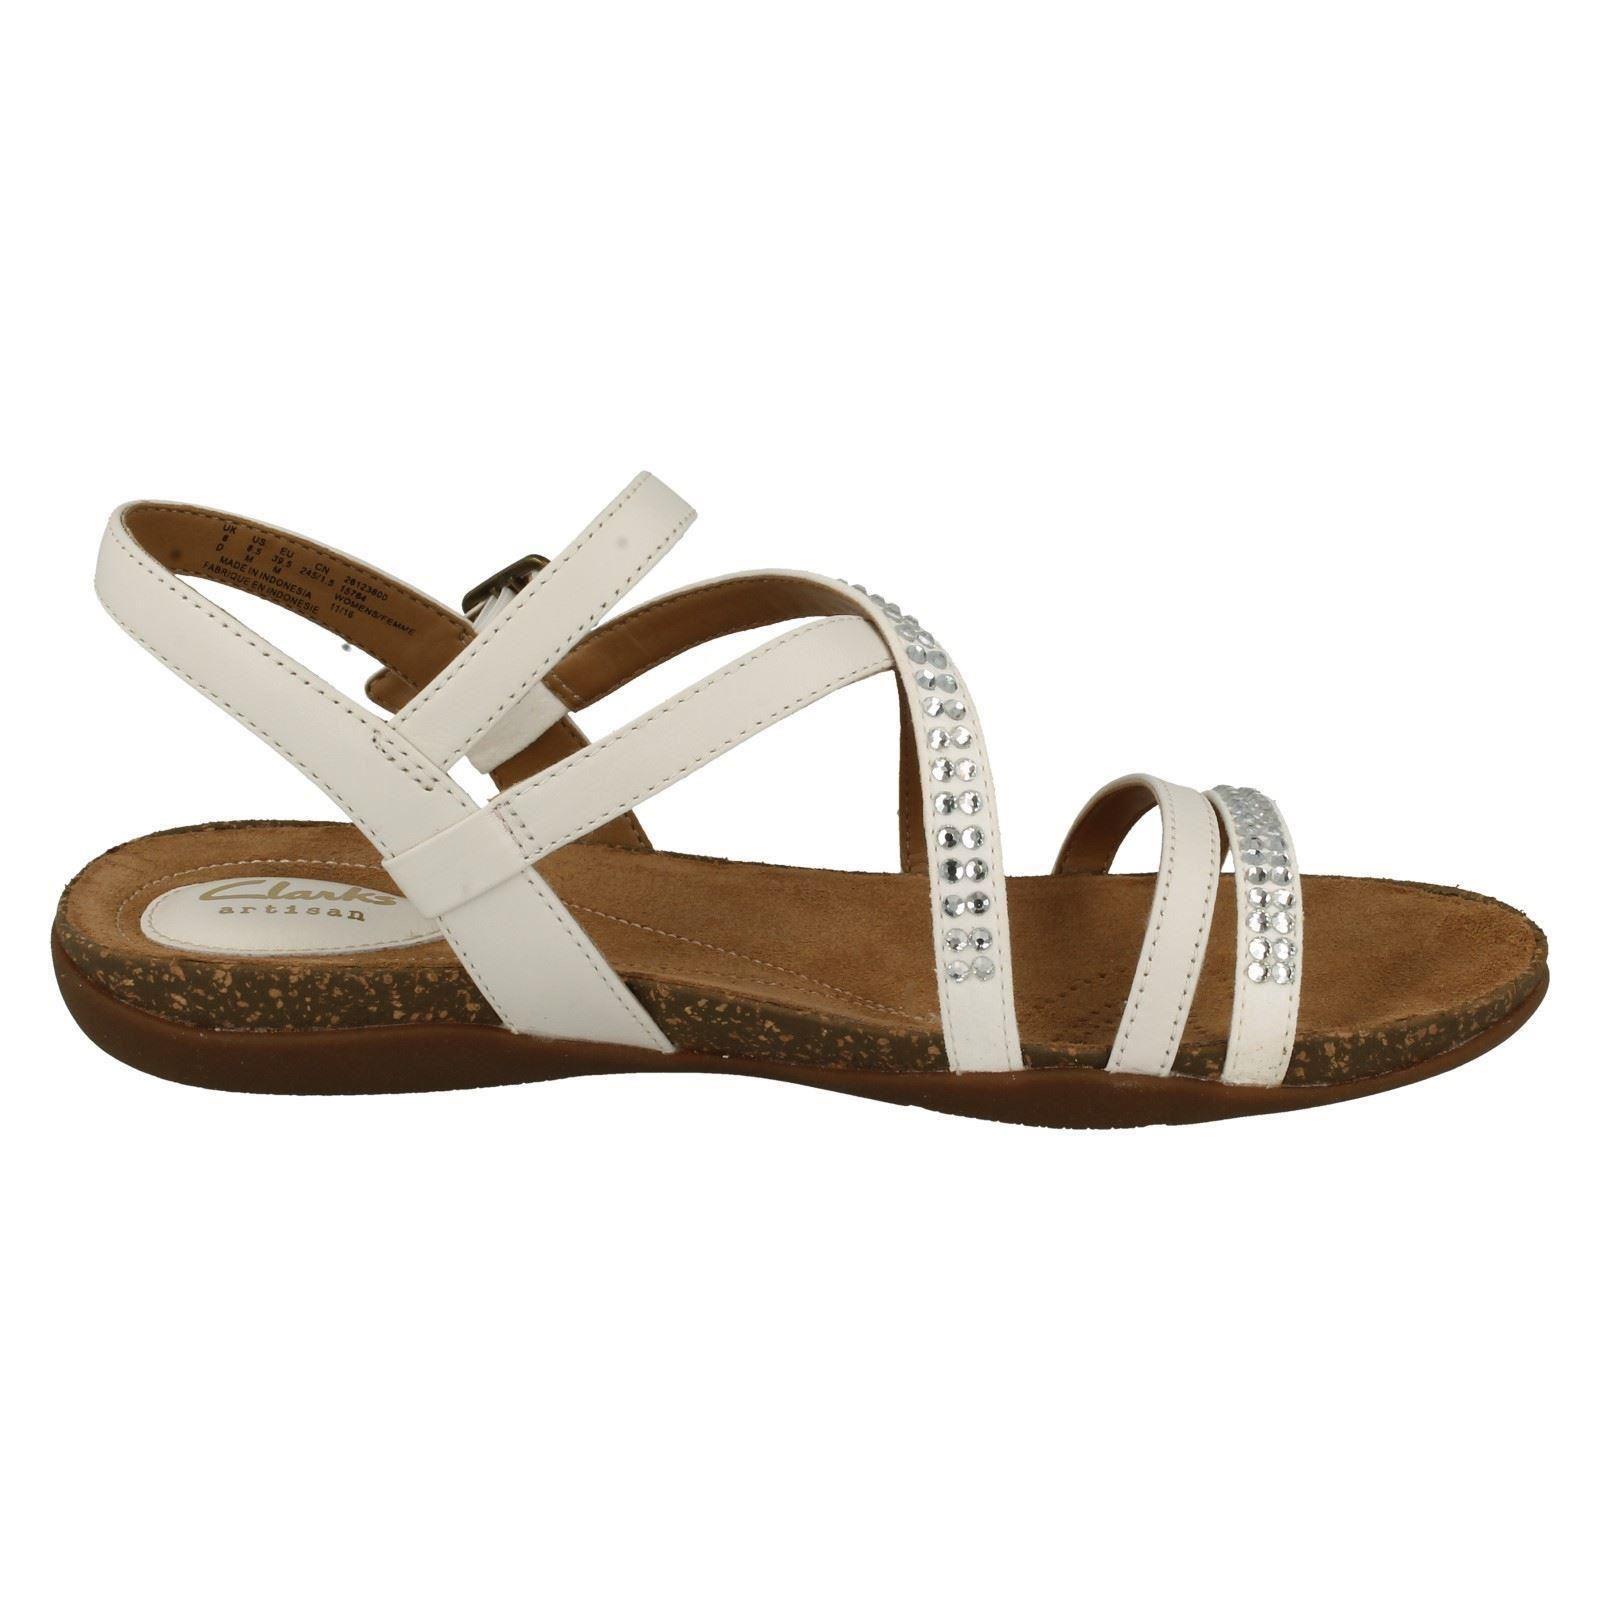 Ladies Clarks Lightweight Summer Sandals Autumn Peace Ebay